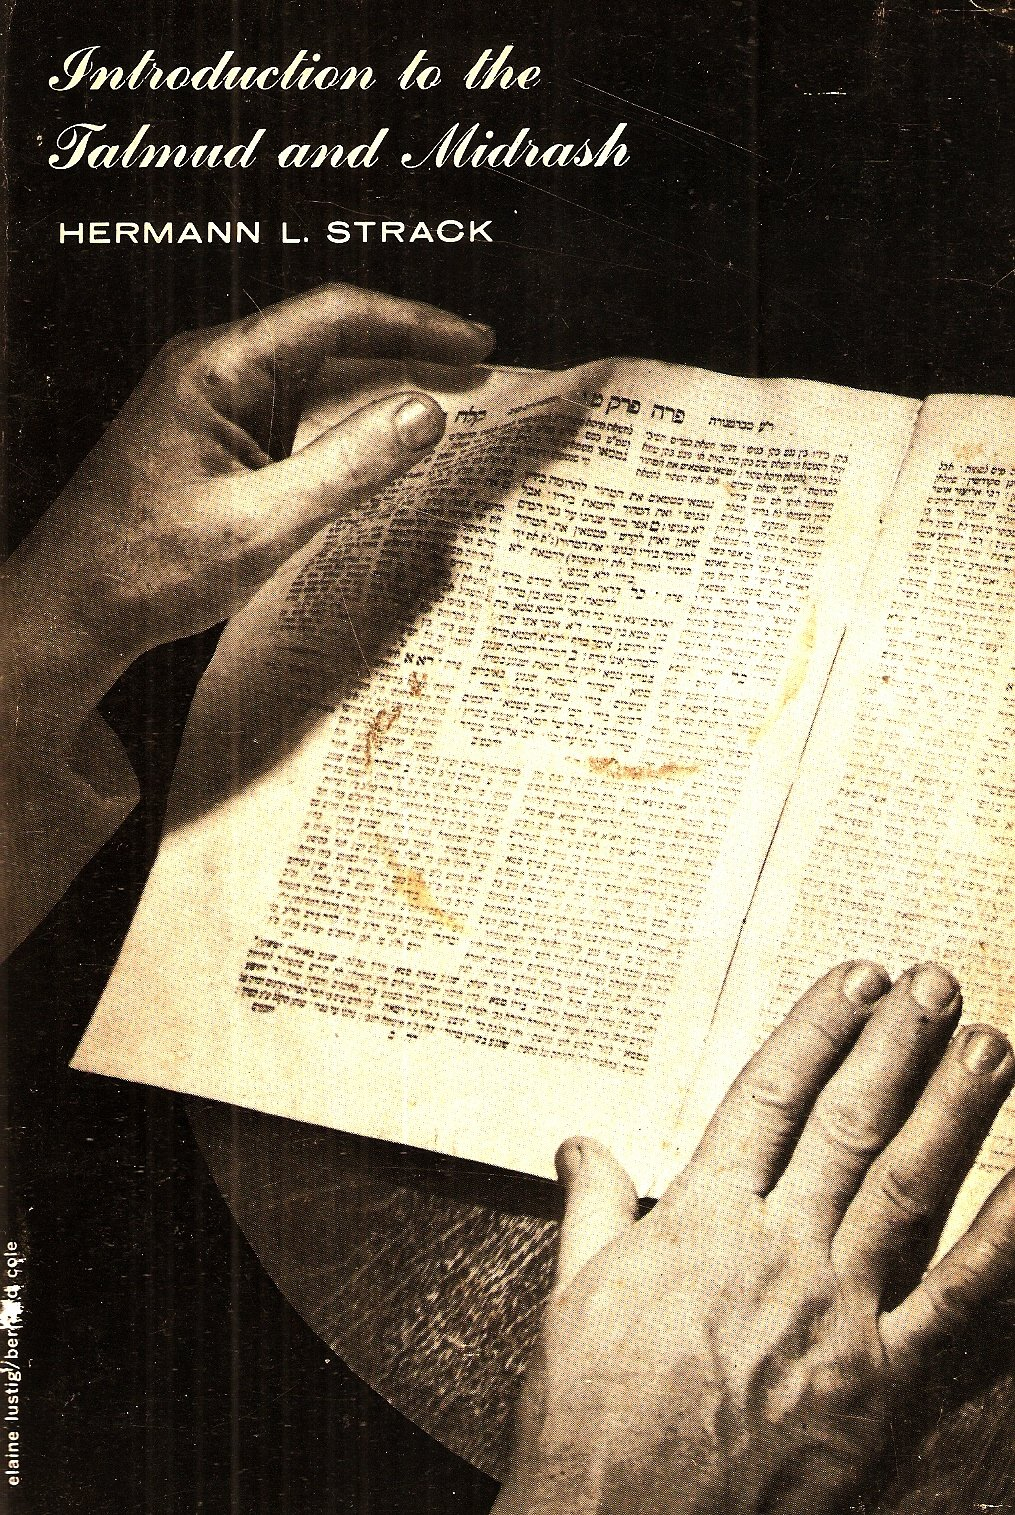 Introduction To the Talmud & Midrash, Strack, Herman